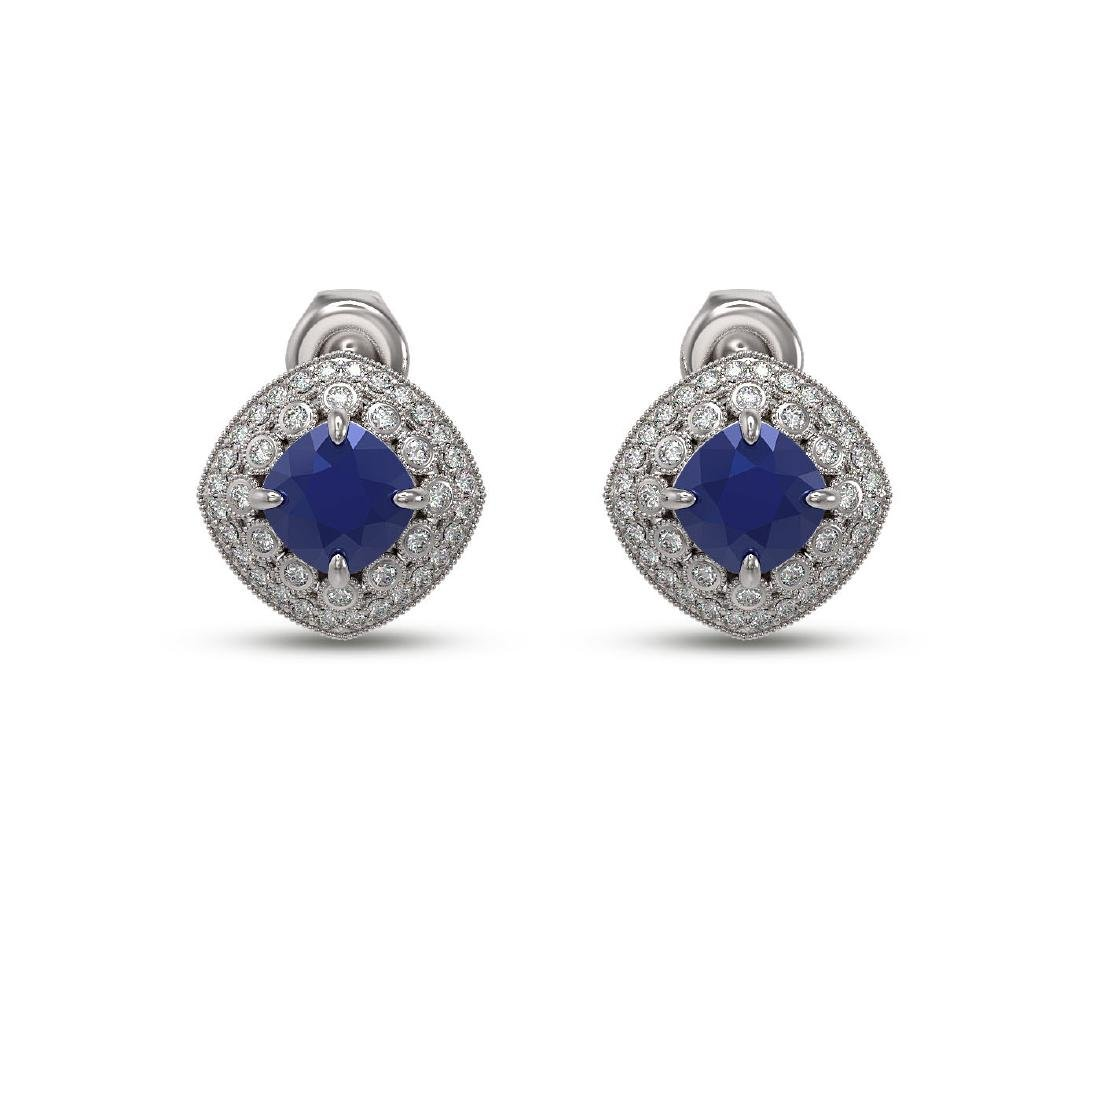 4.99 ctw Sapphire & Diamond Earrings 14K White Gold -